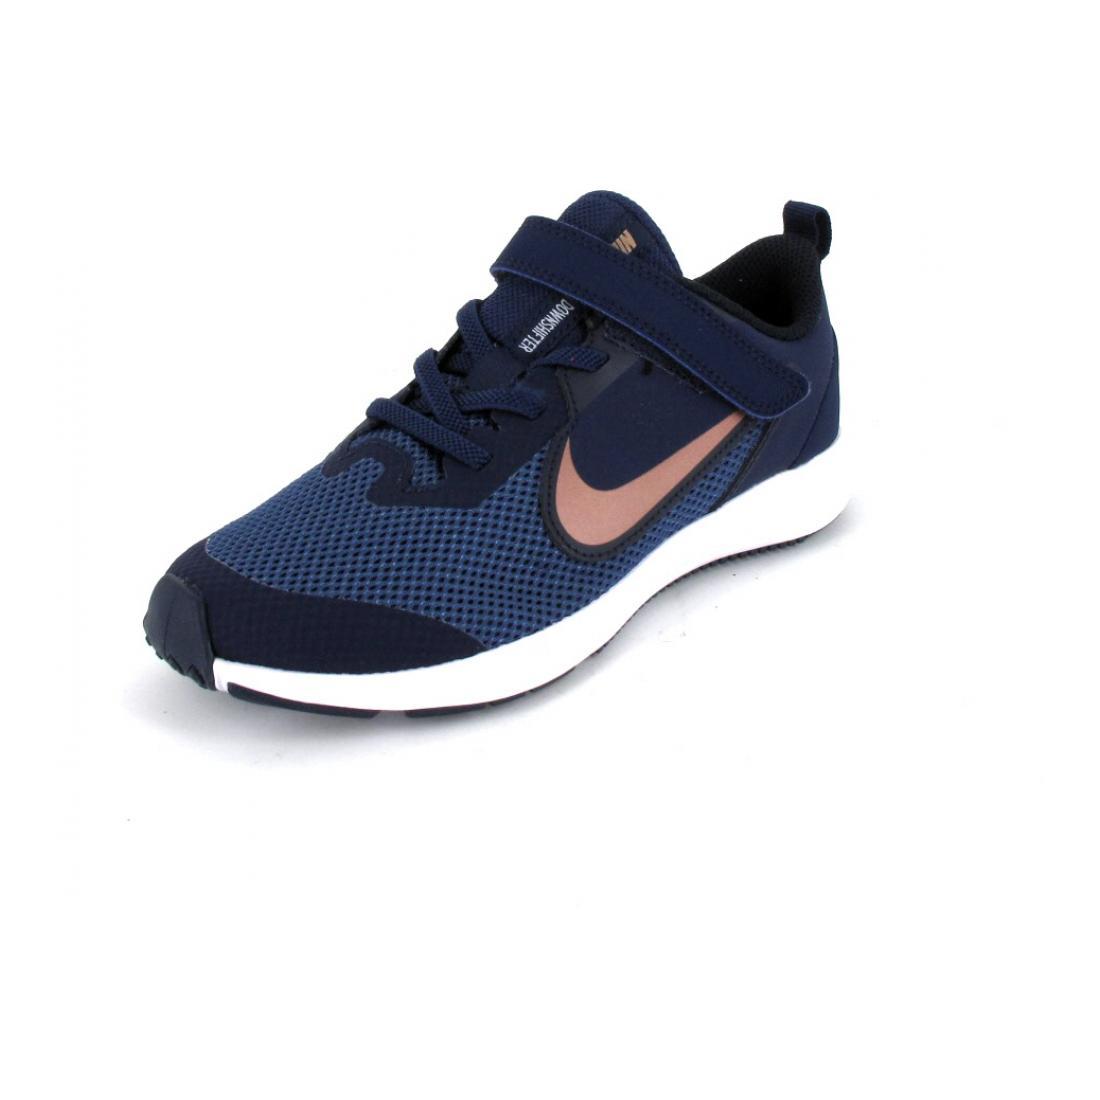 Nike Sportschuh Downshifter 9